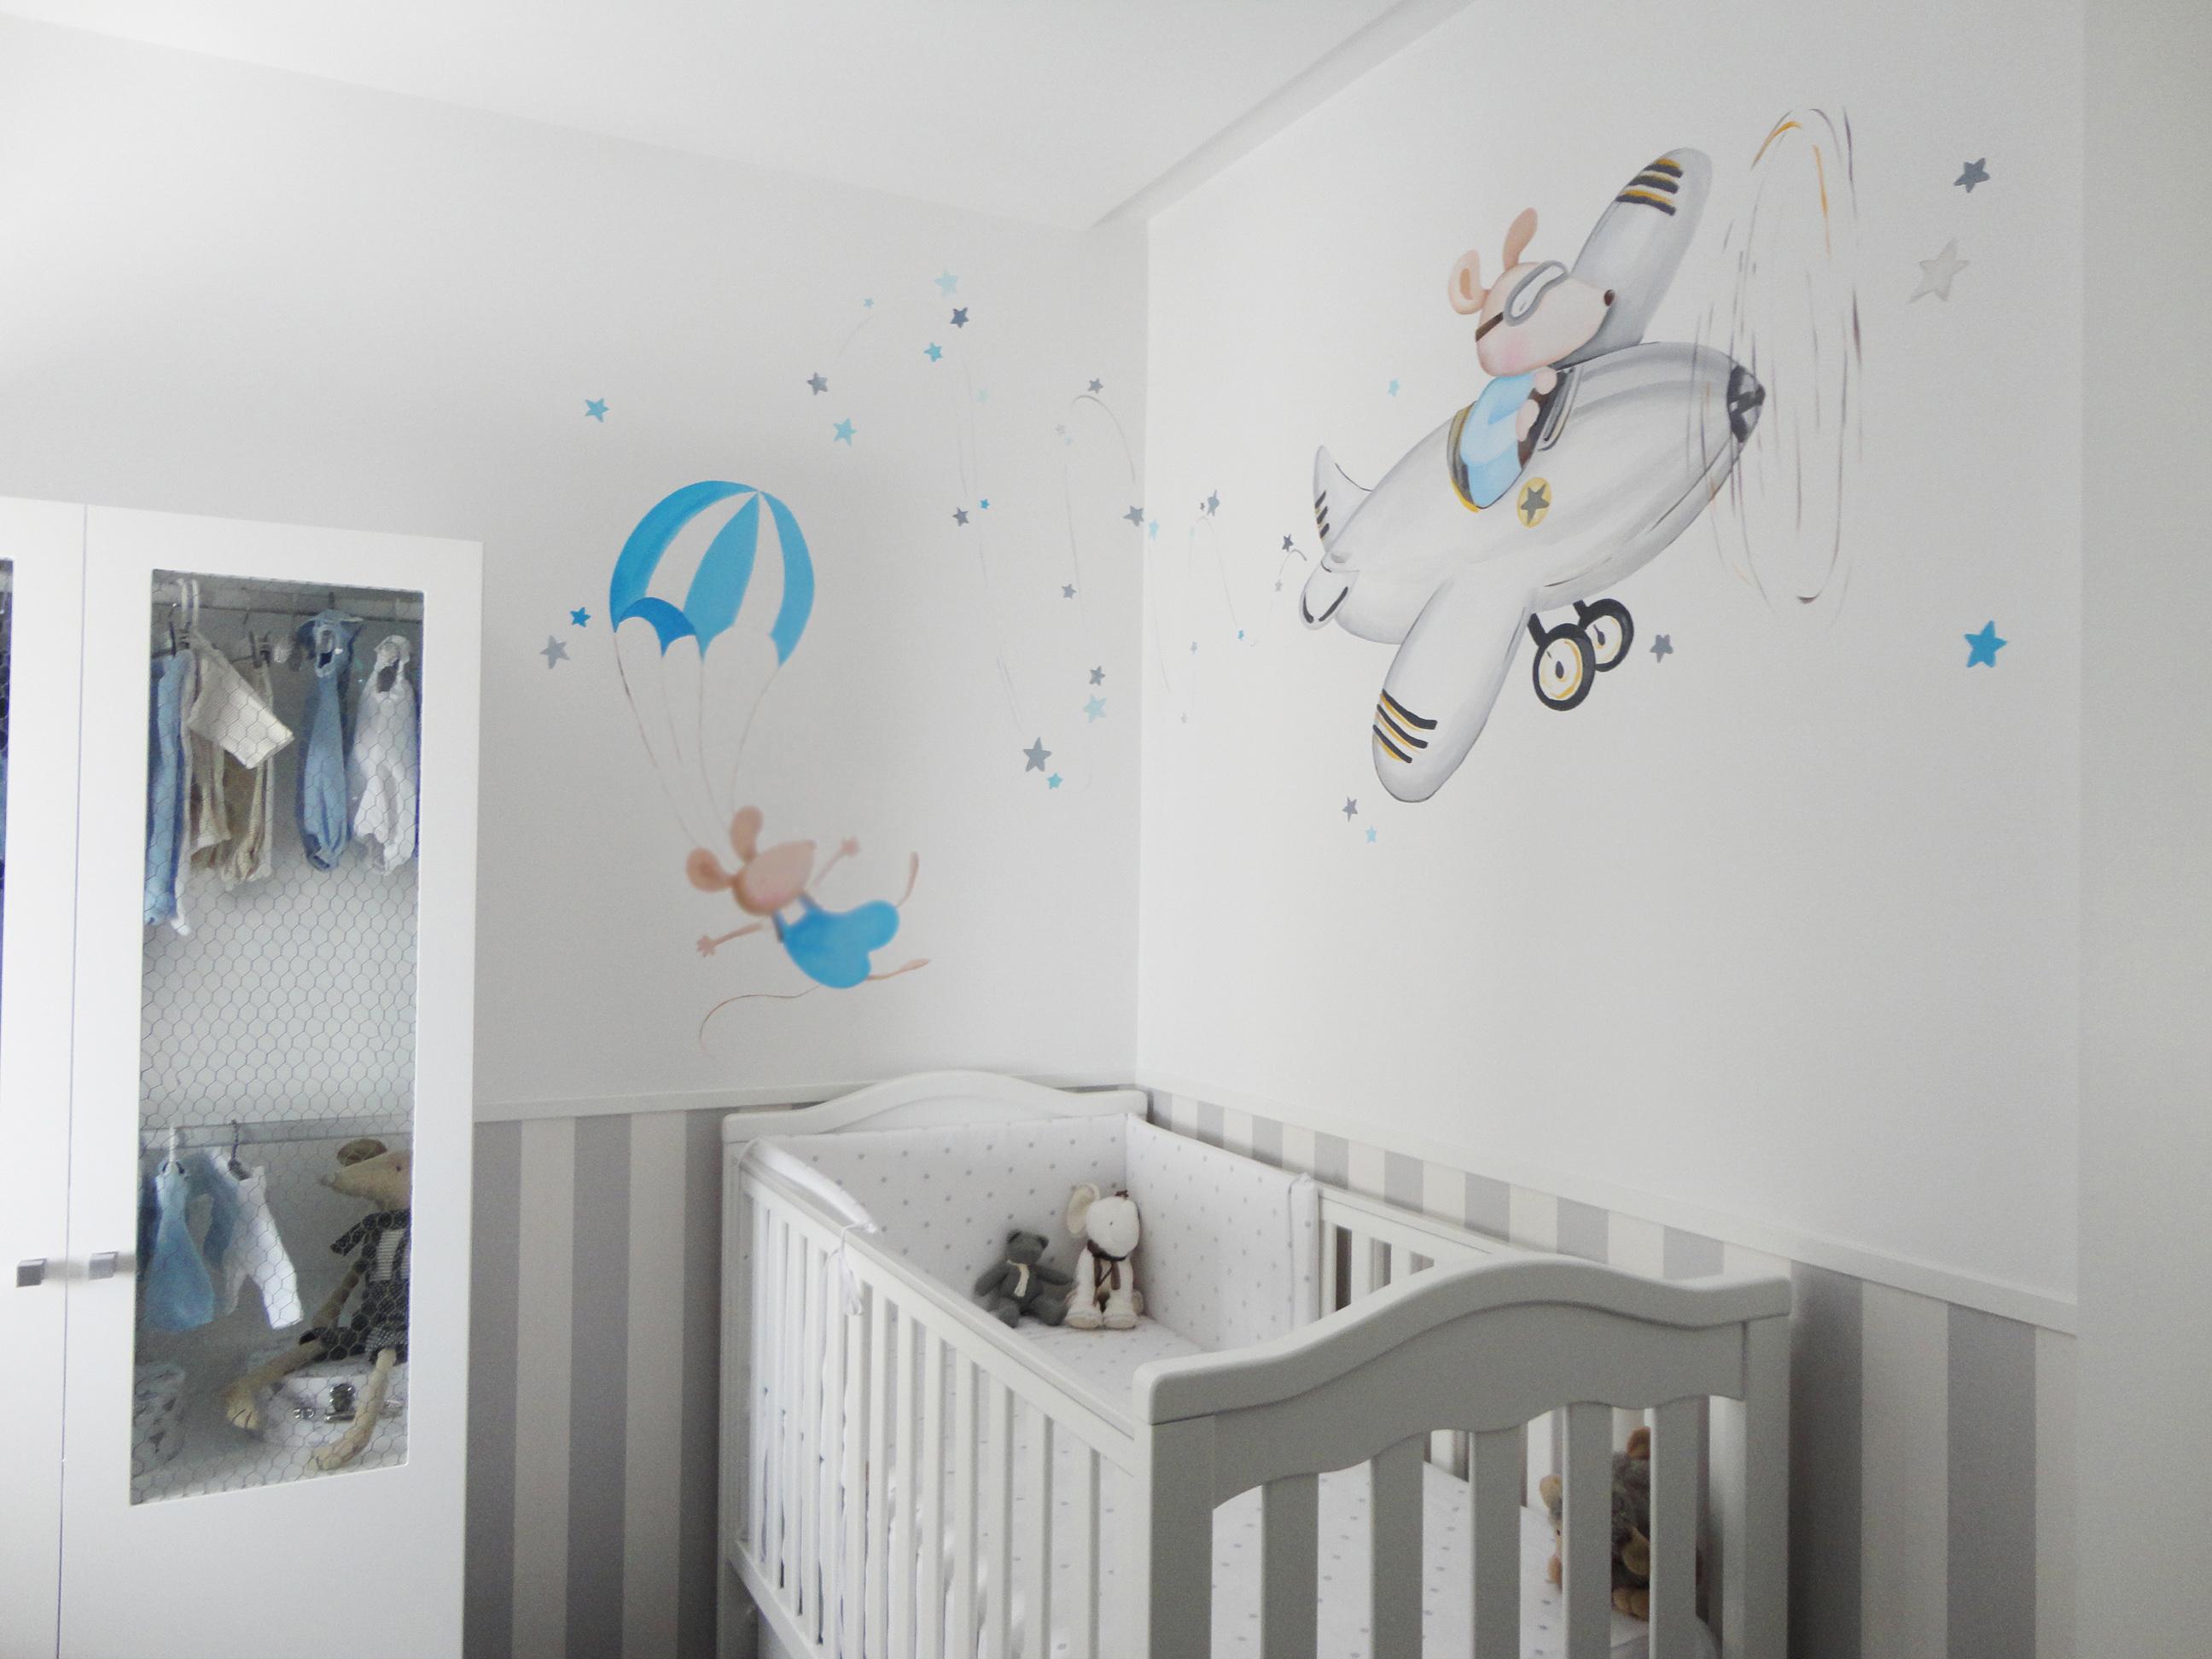 Murales infantiles murales pintados a mano sobre paredes - Decoracion paredes habitacion infantil ...